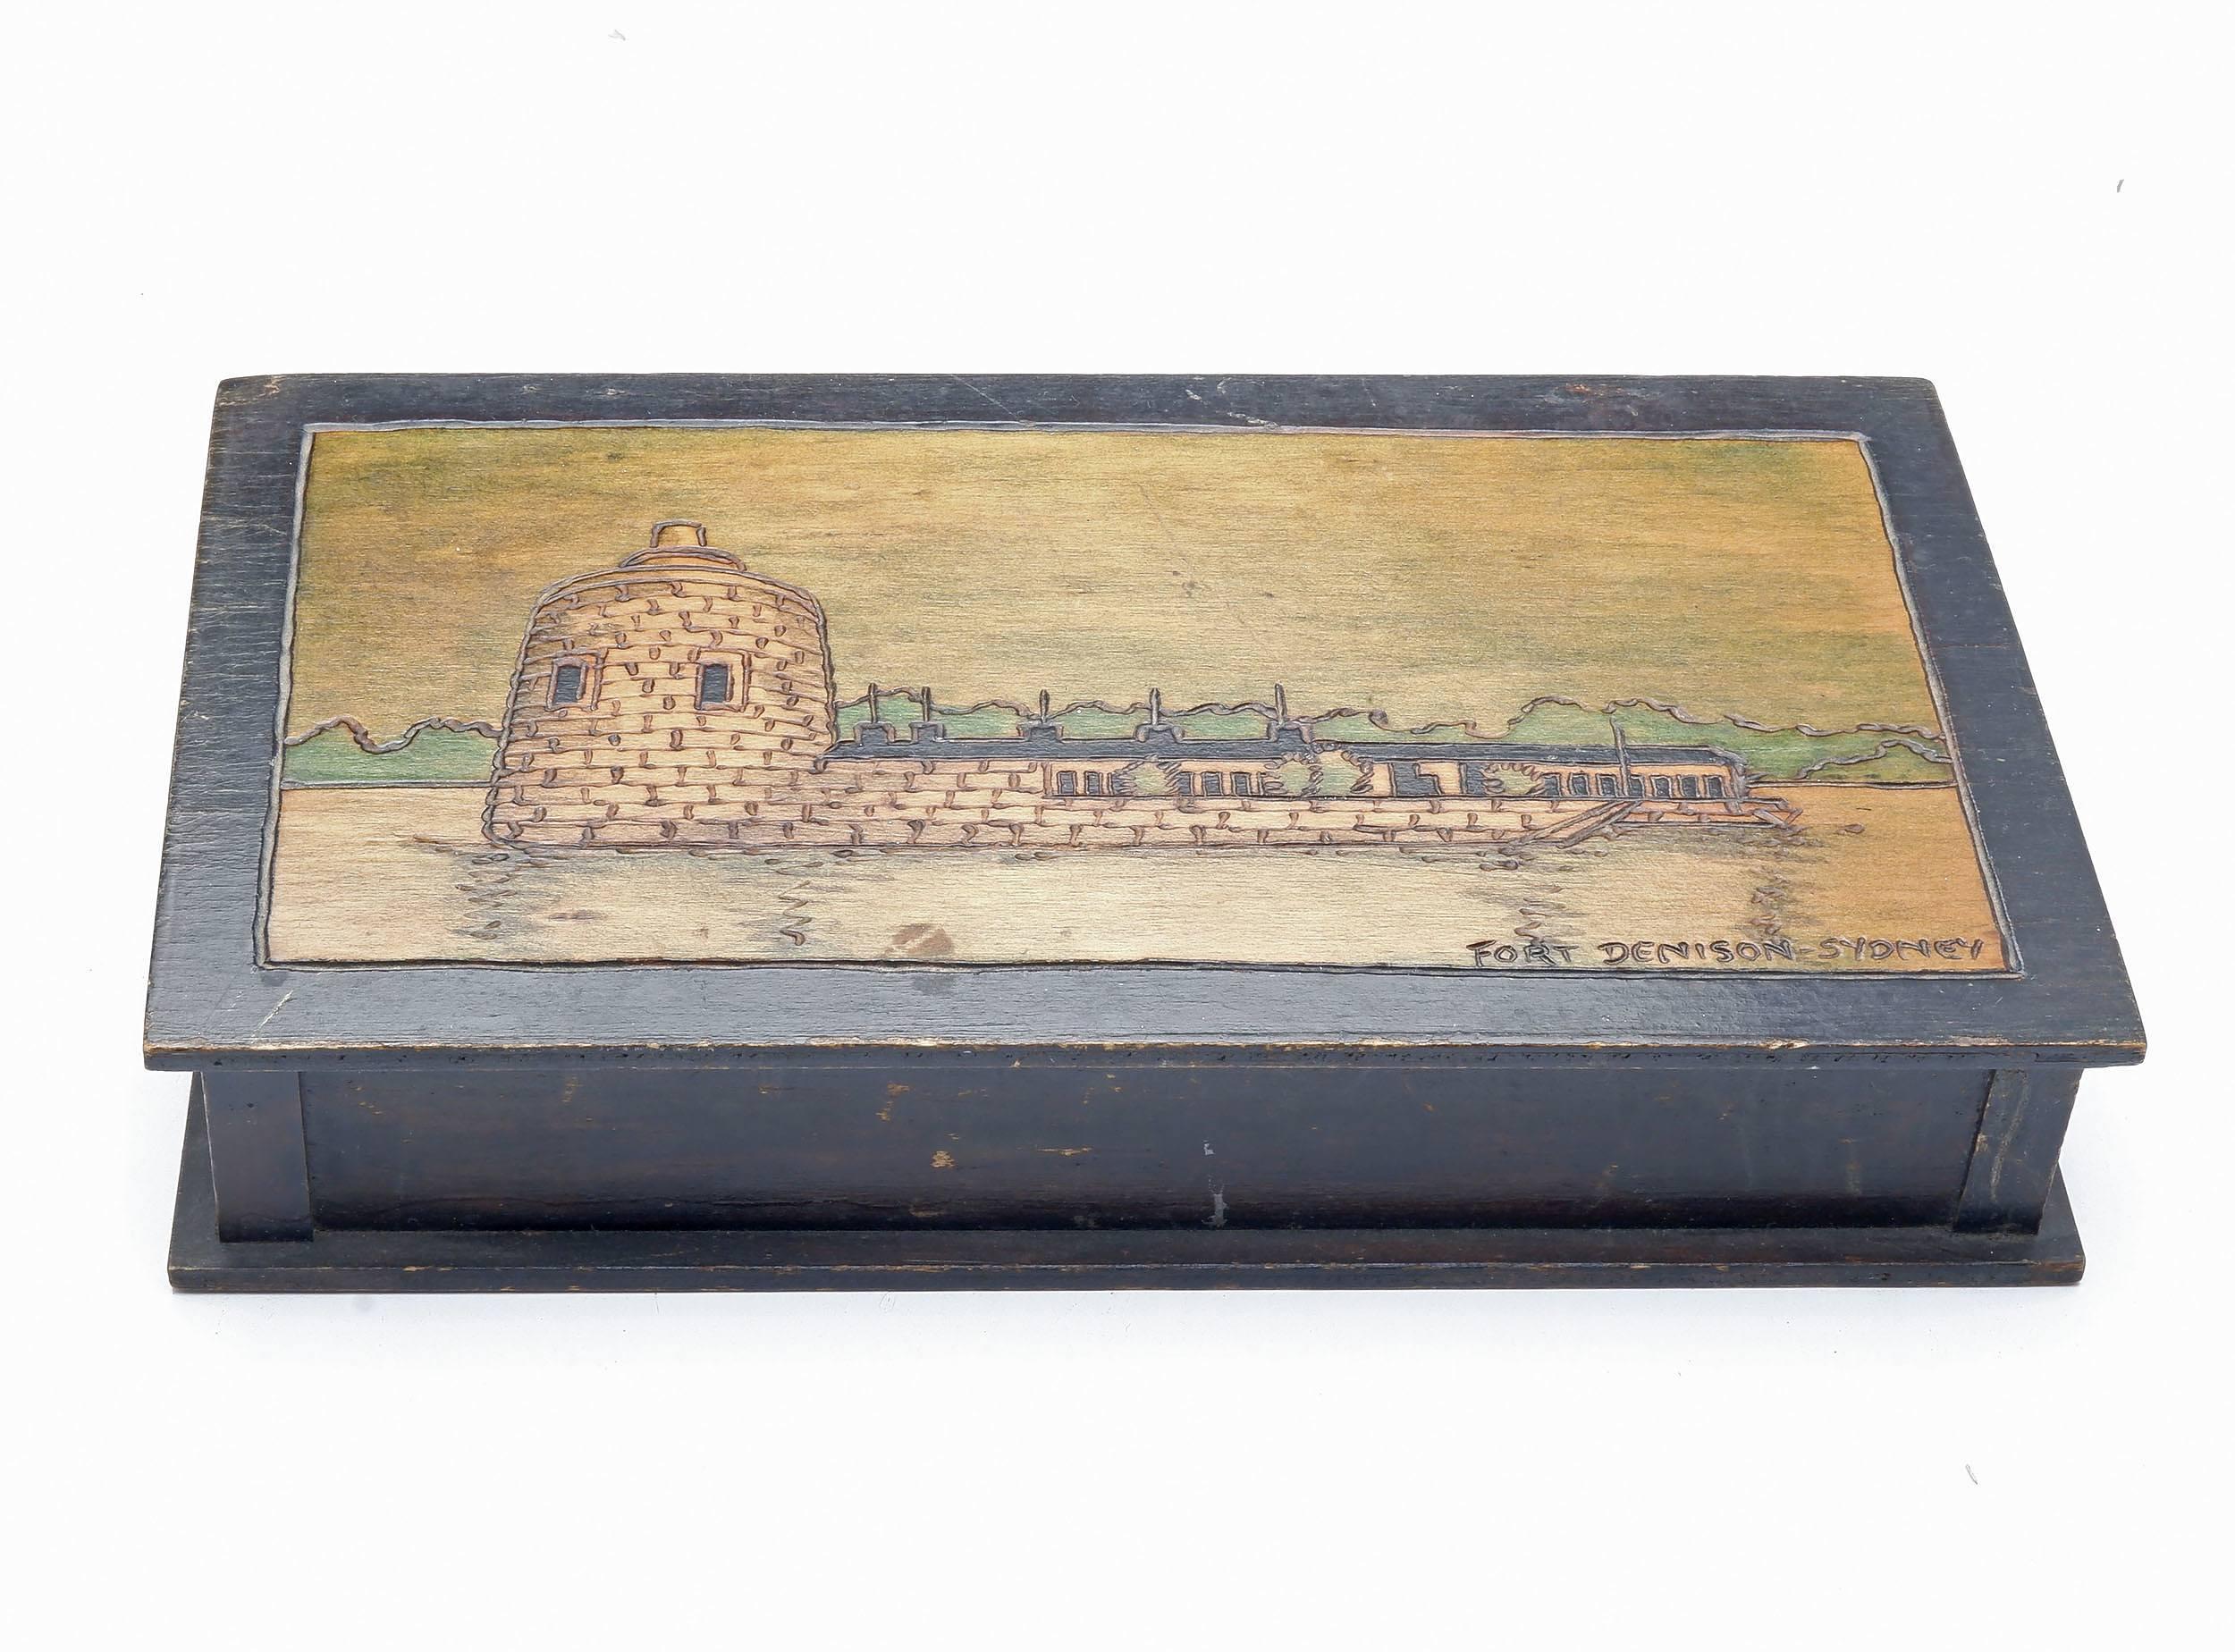 'Pokerwork Box with Decoration of Fort Denison, Sydney'